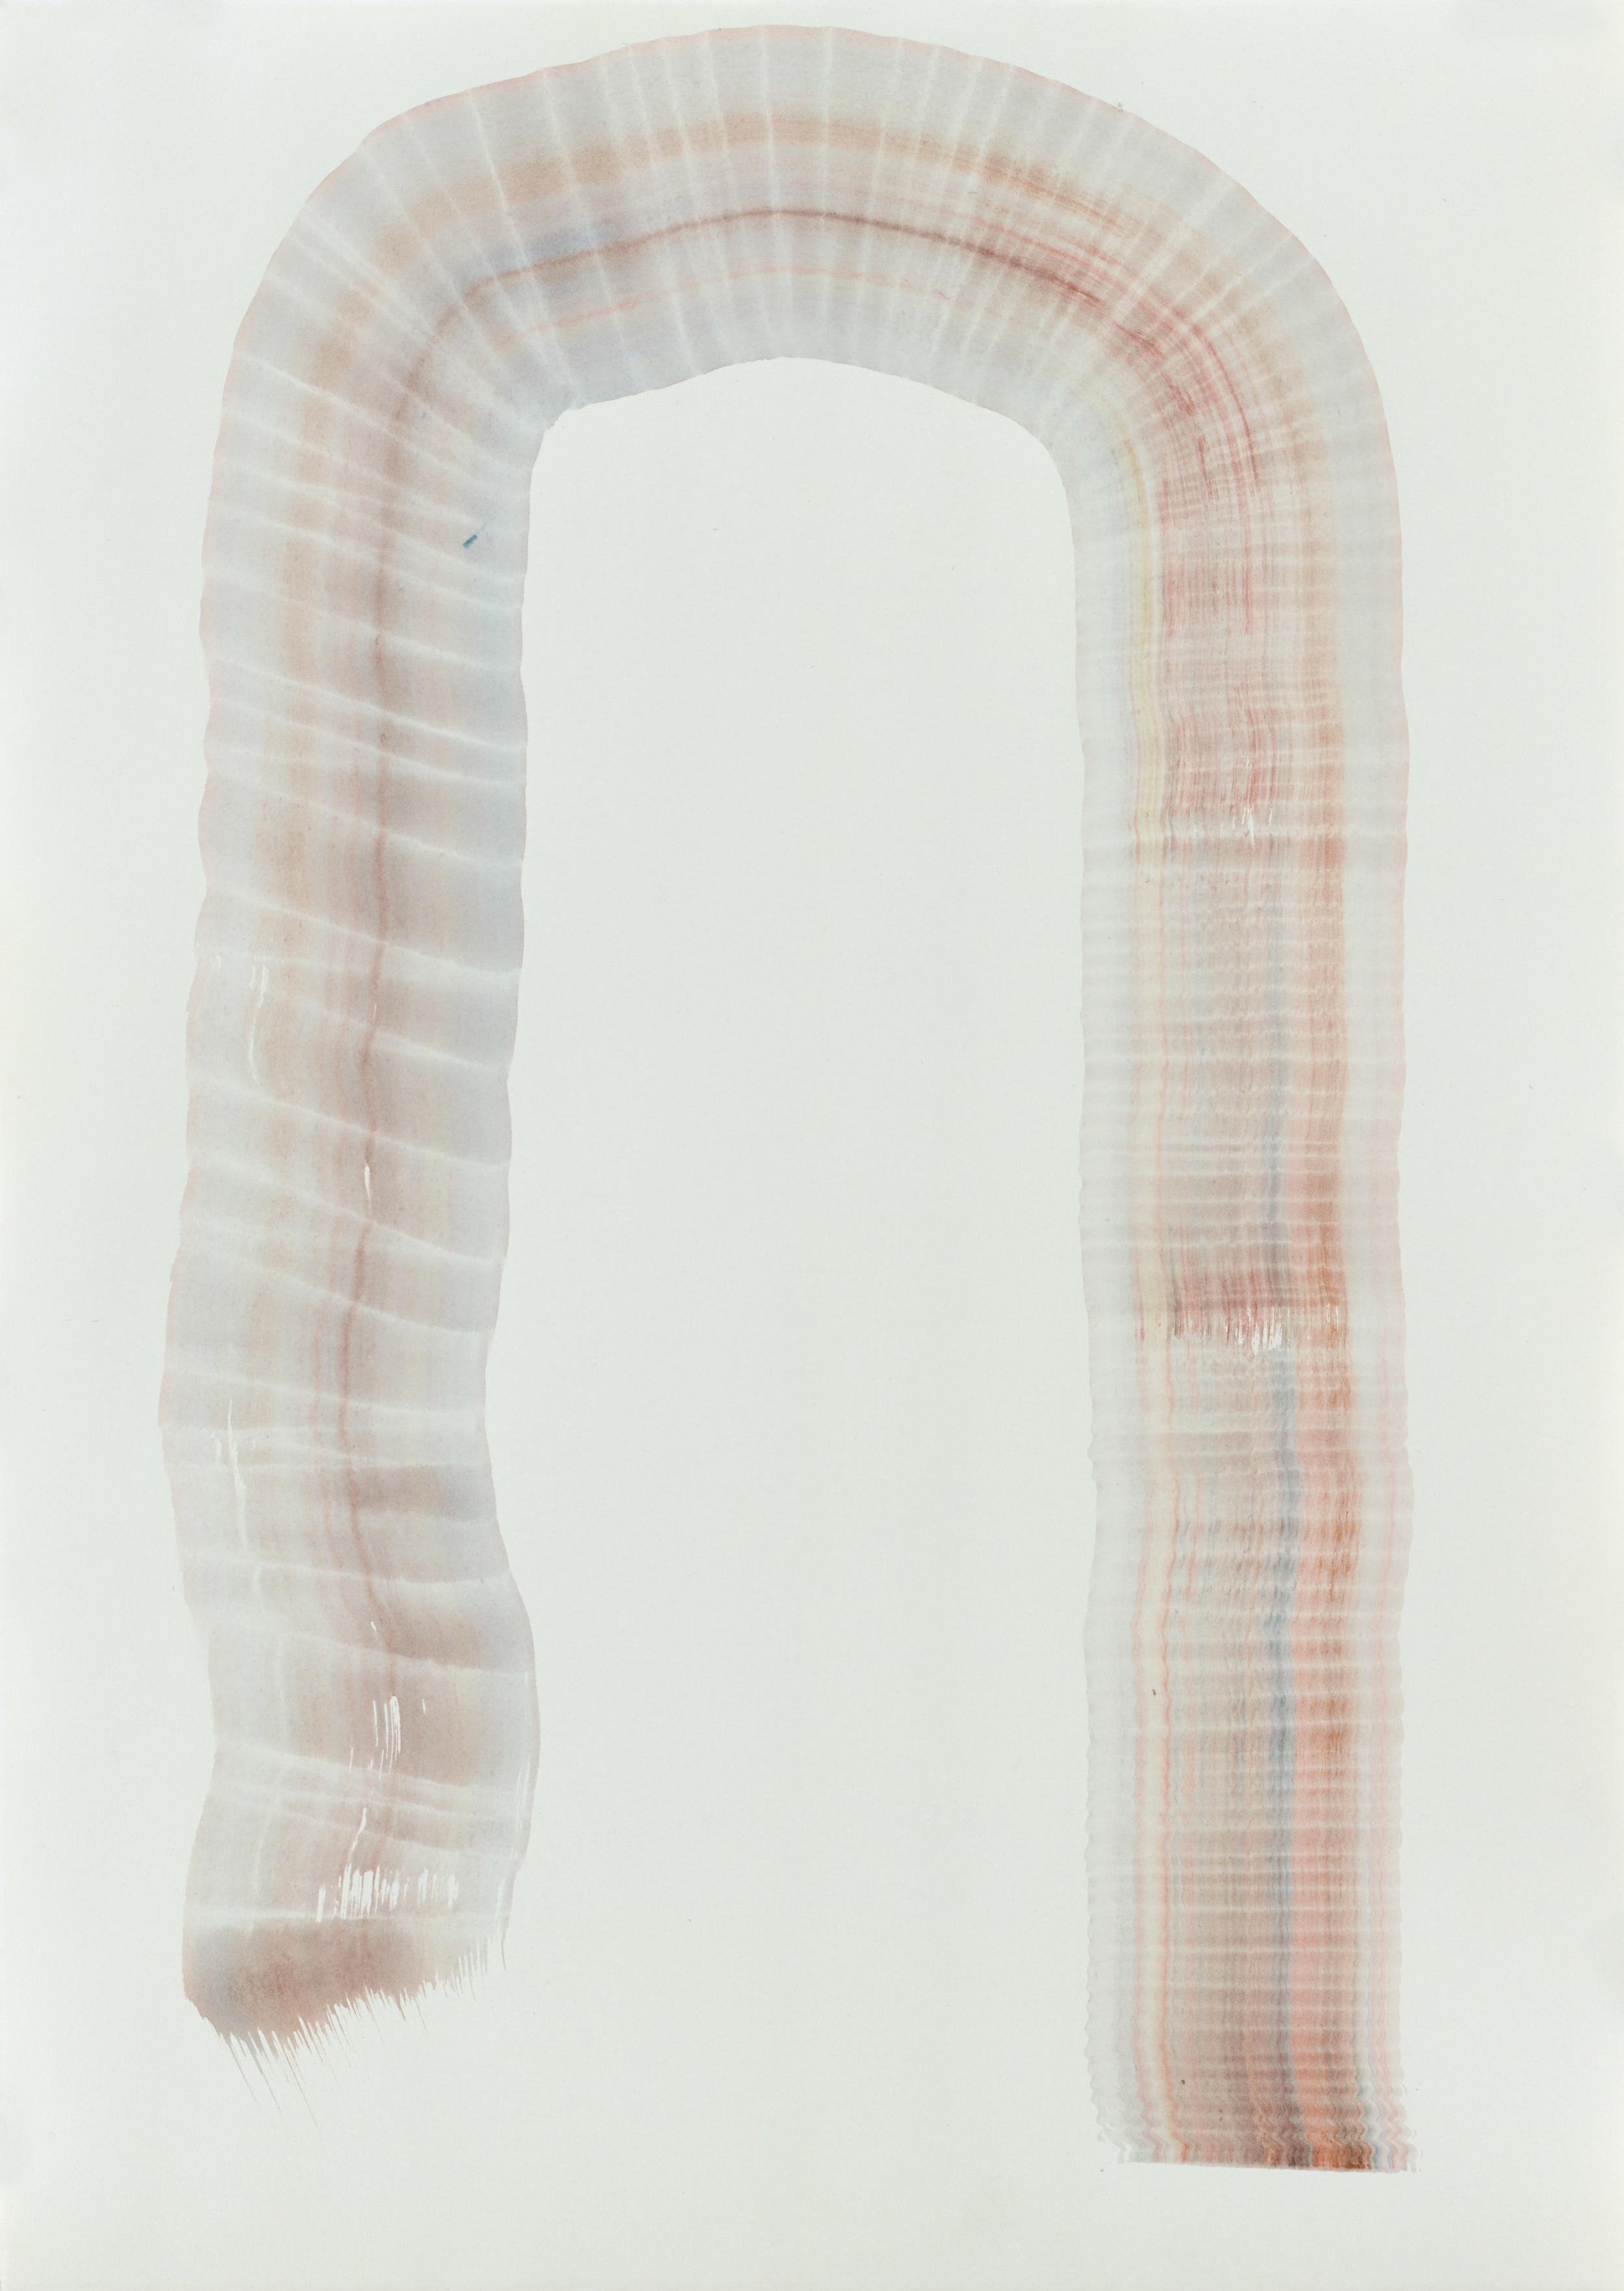 BK P0684 | untitled | acrylic on paper | 59x42cm | 2015